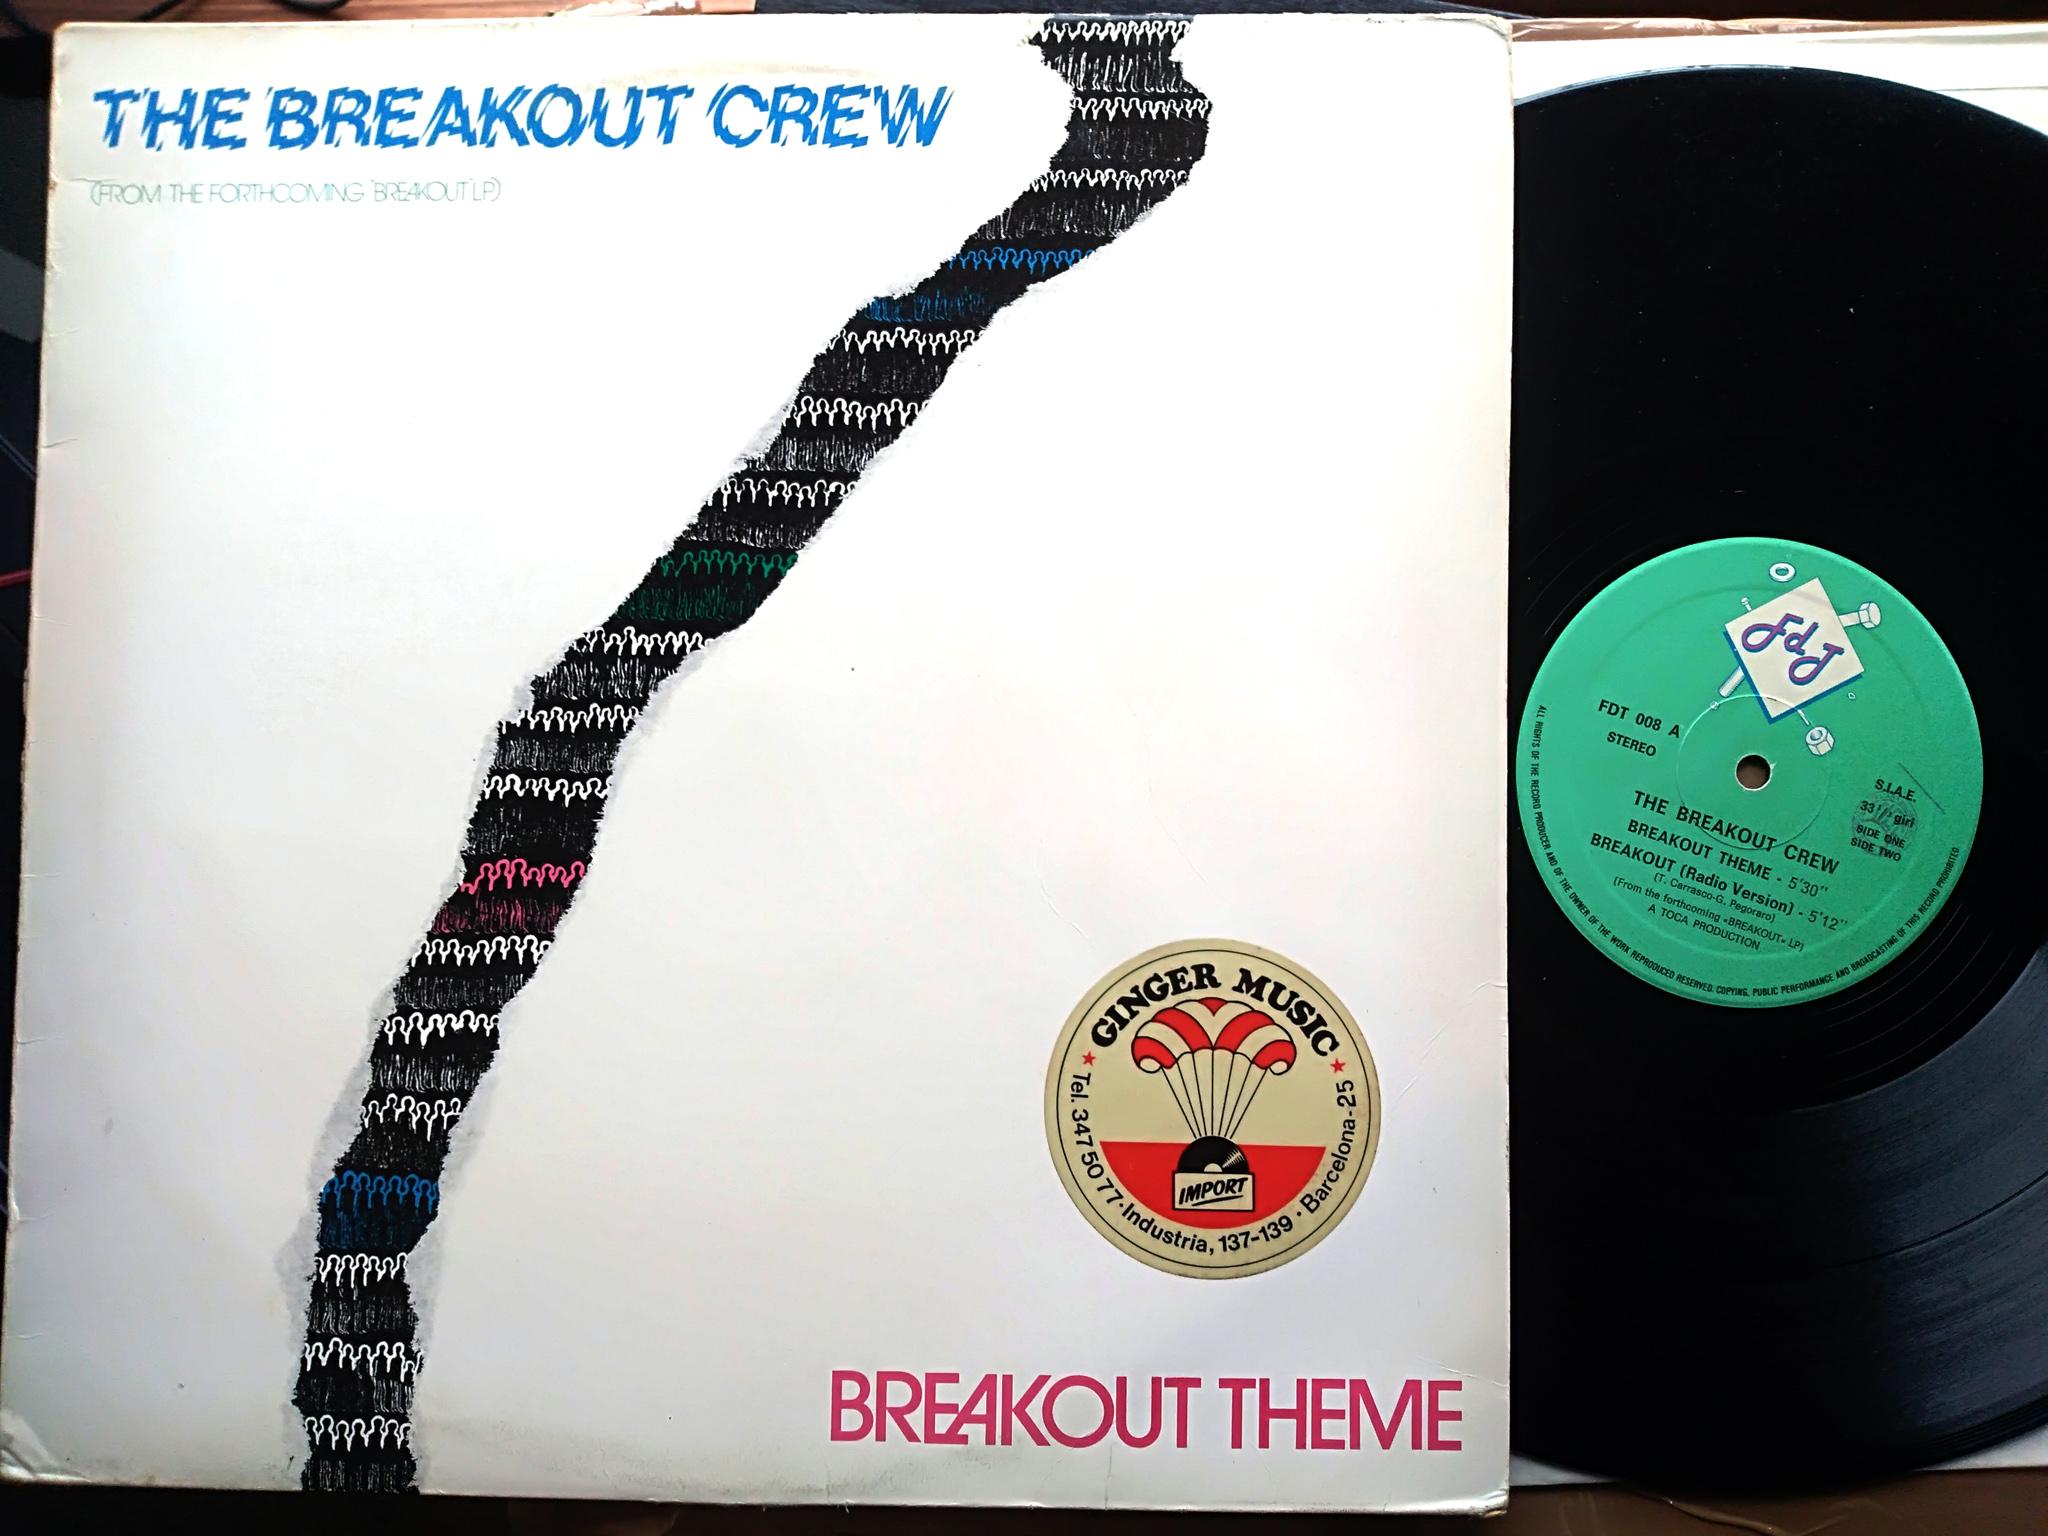 The Breakout Crew - Breakout Theme